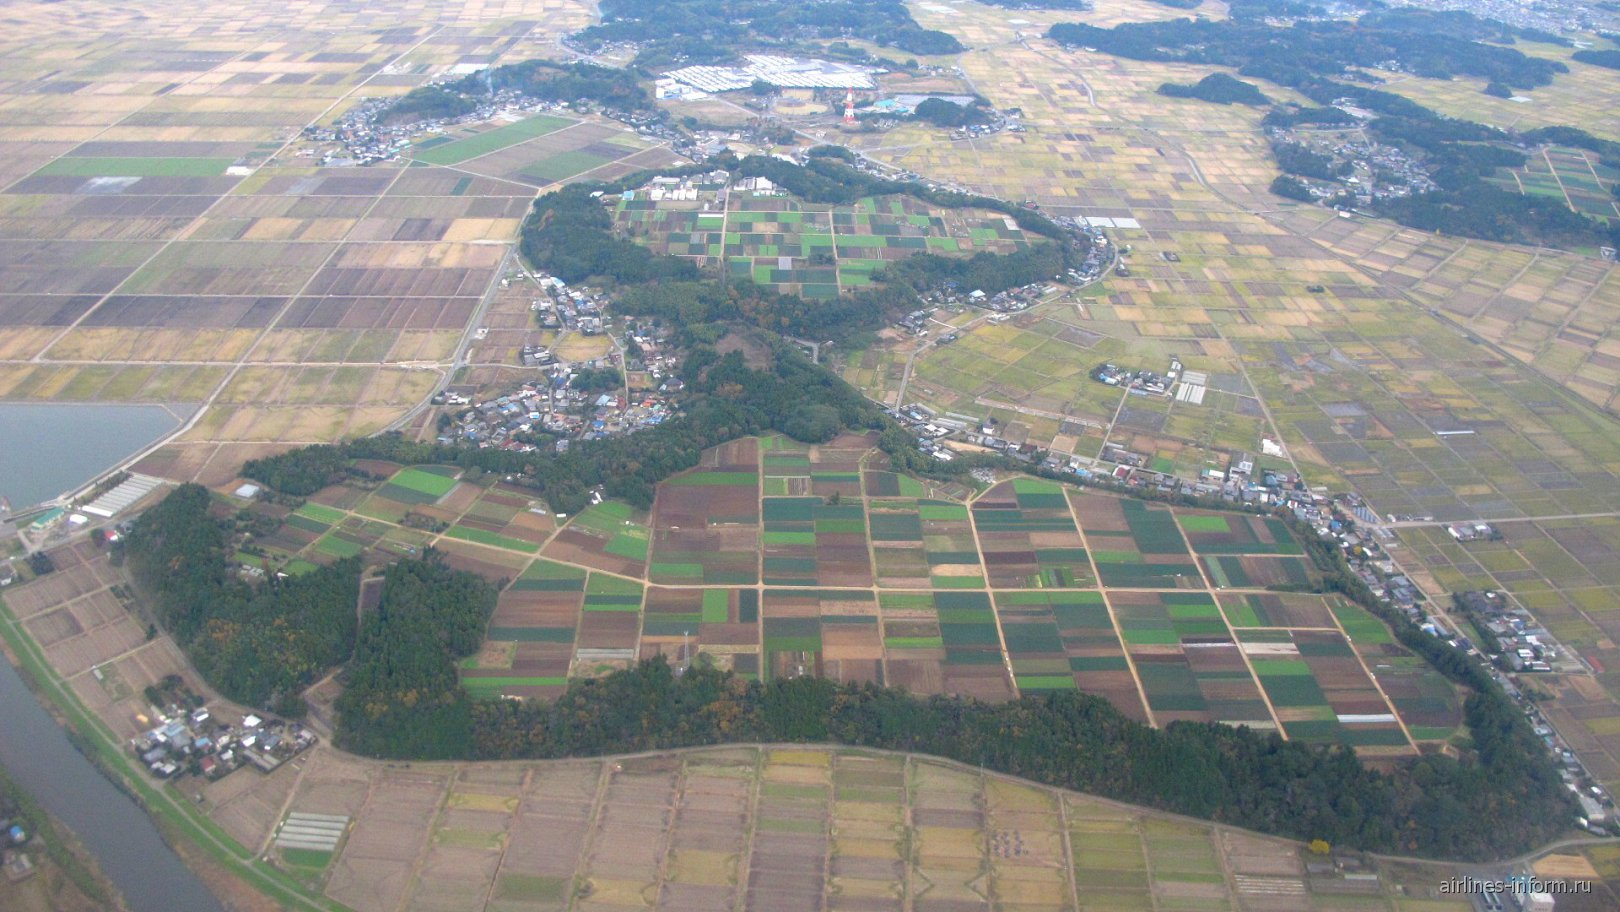 В полете над Японией перед посадкой в аэропорту Нарита